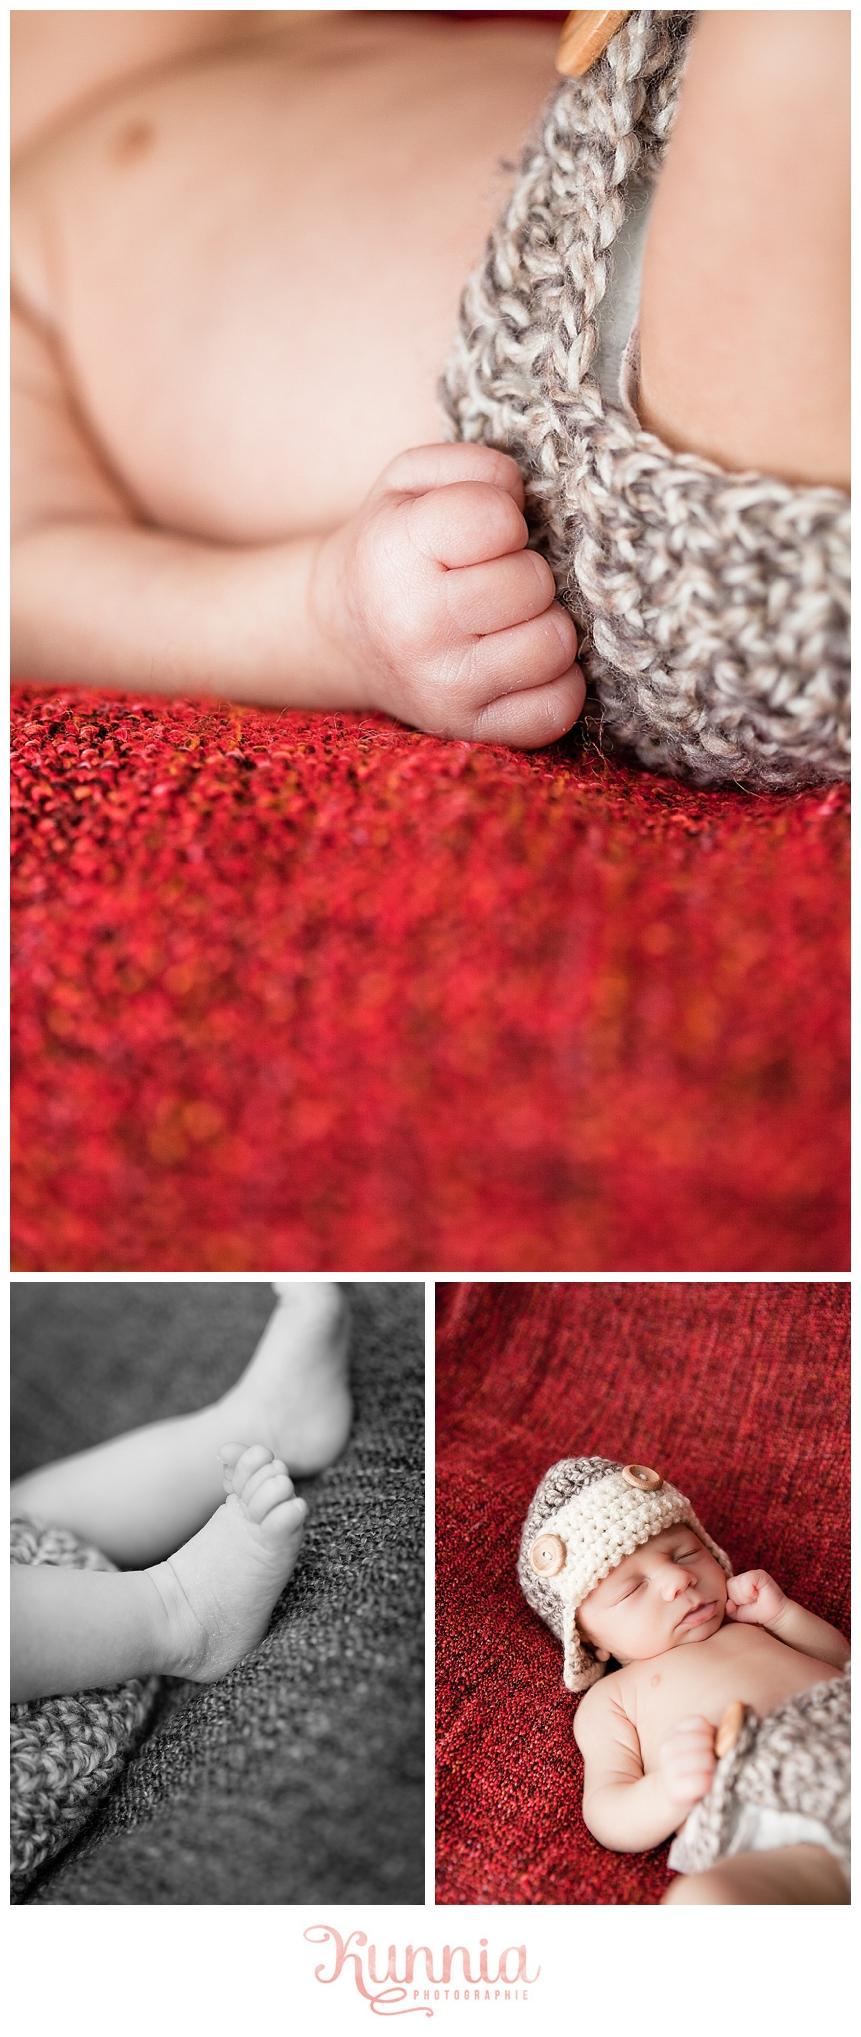 séance photo bébé 1 mois calvados